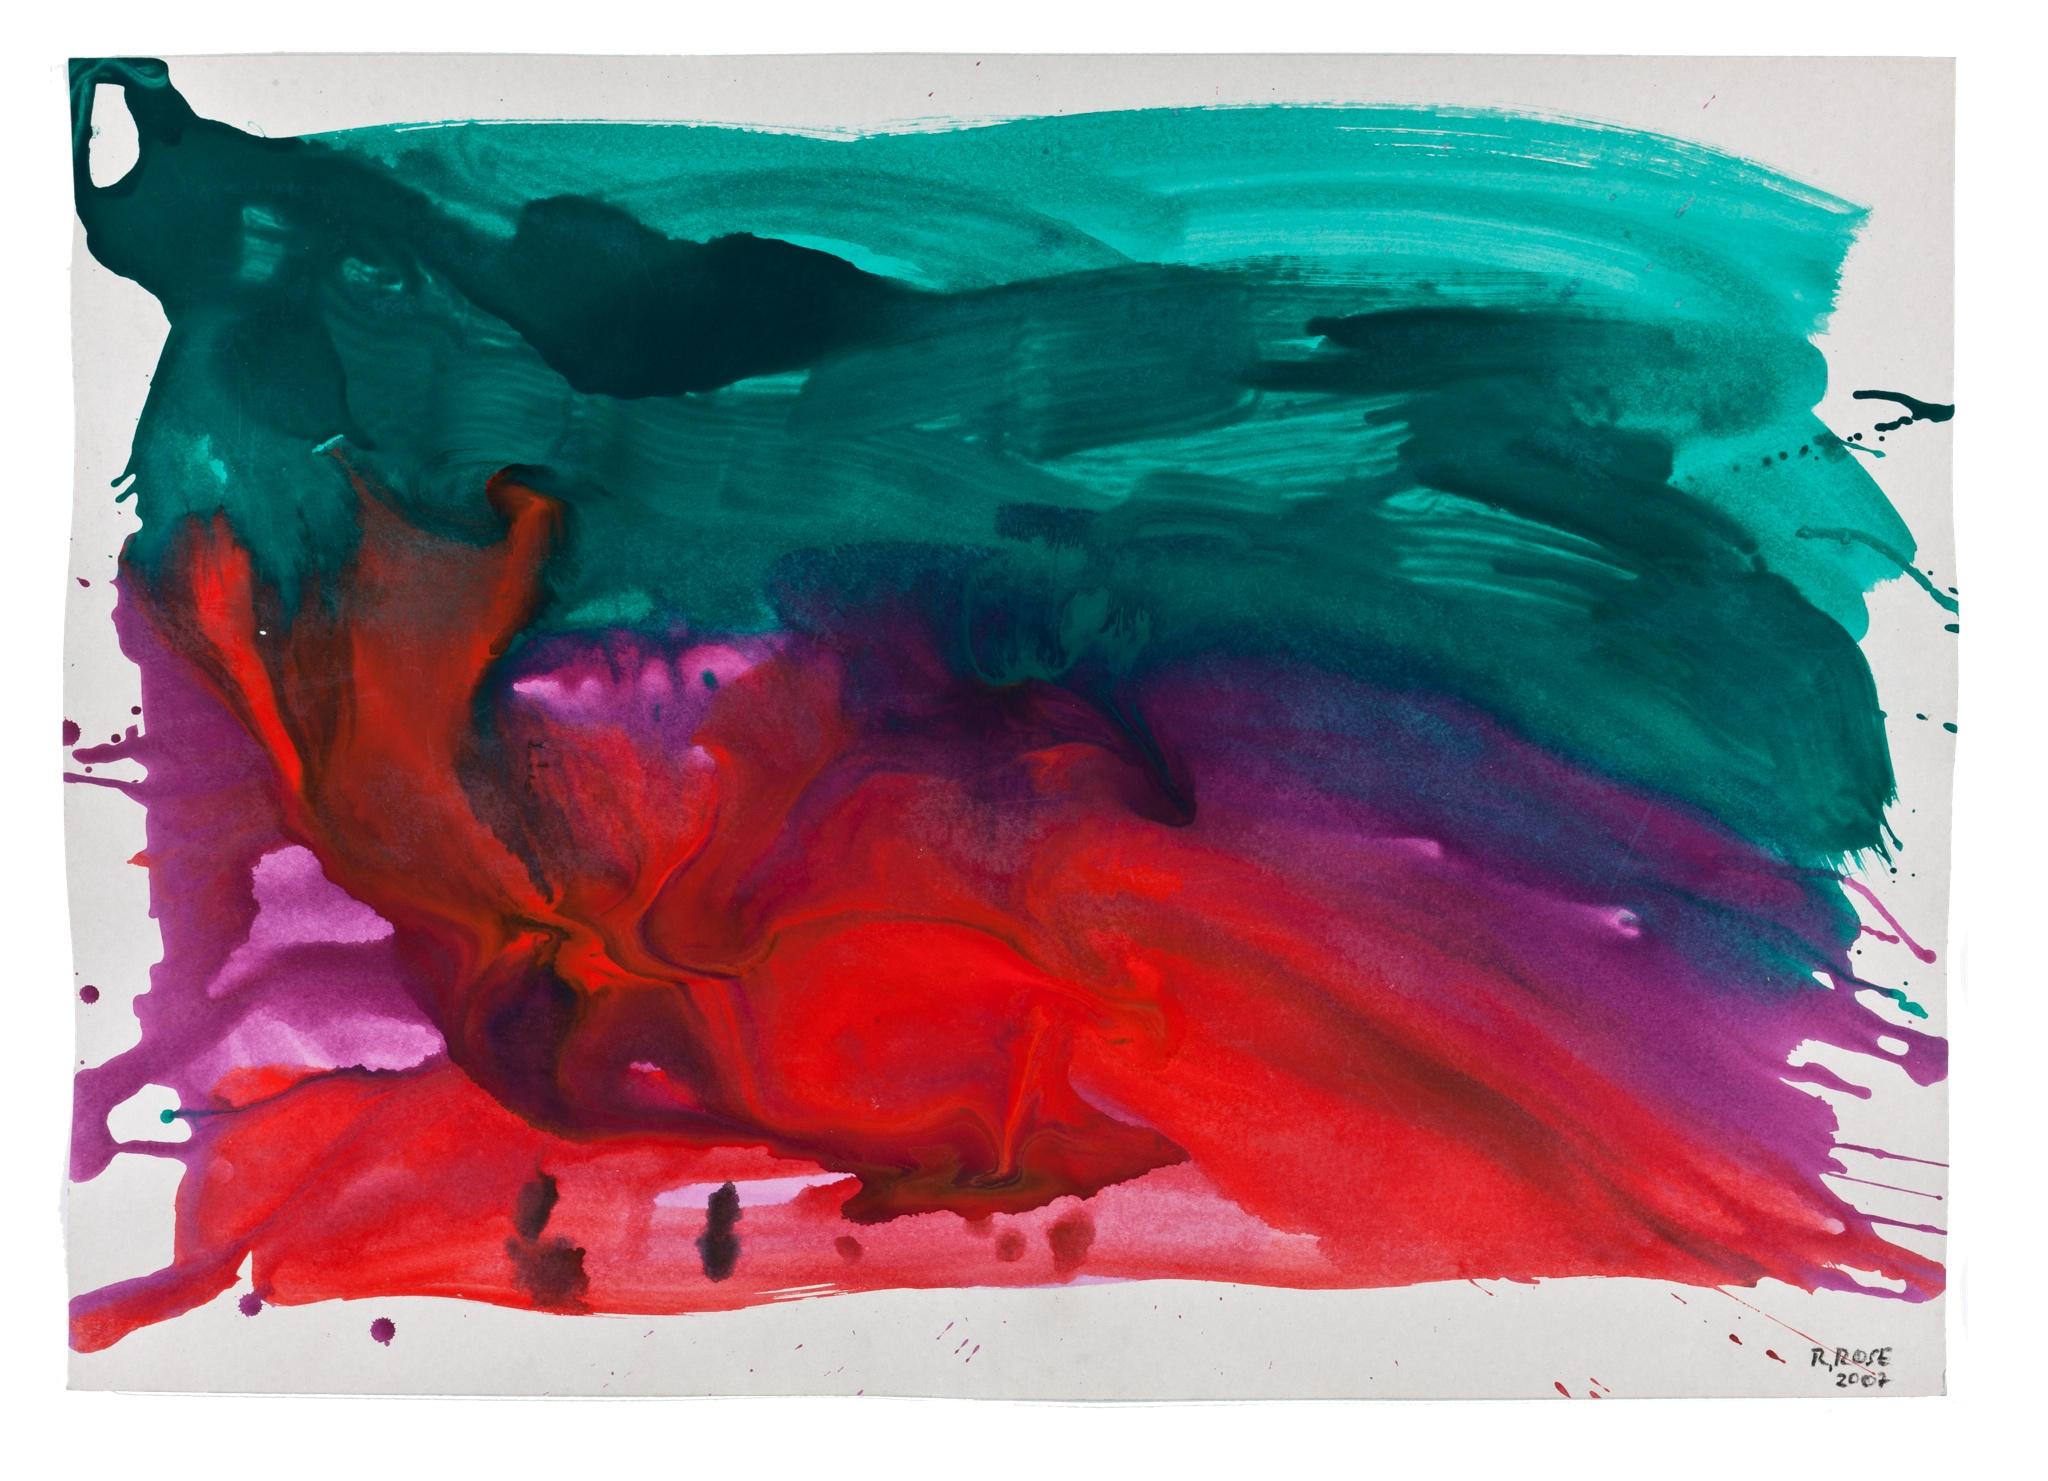 Rolf Rose, 74,5 x 105 cm, Aquarell und Acryl auf Pappe